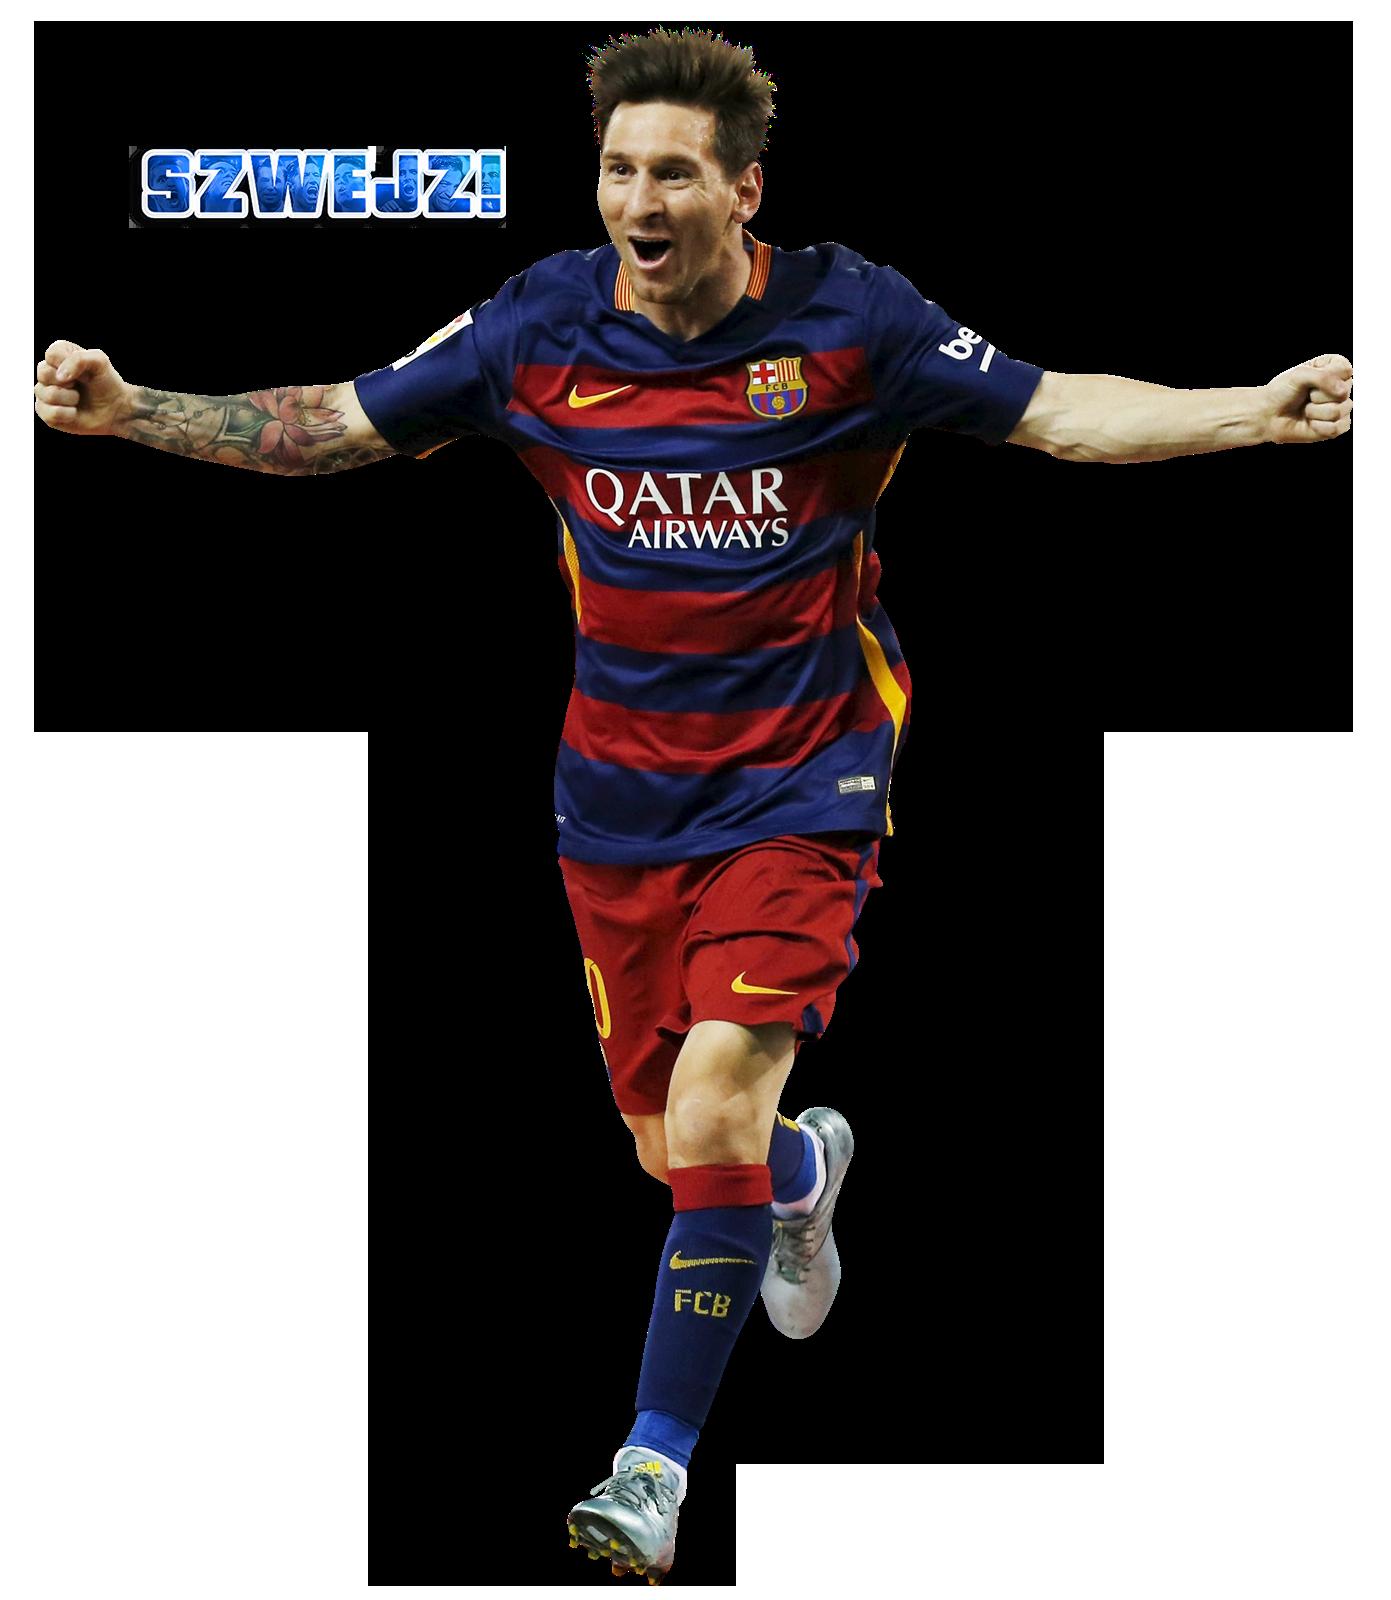 Lionel Messi by szwejzi on DeviantArt